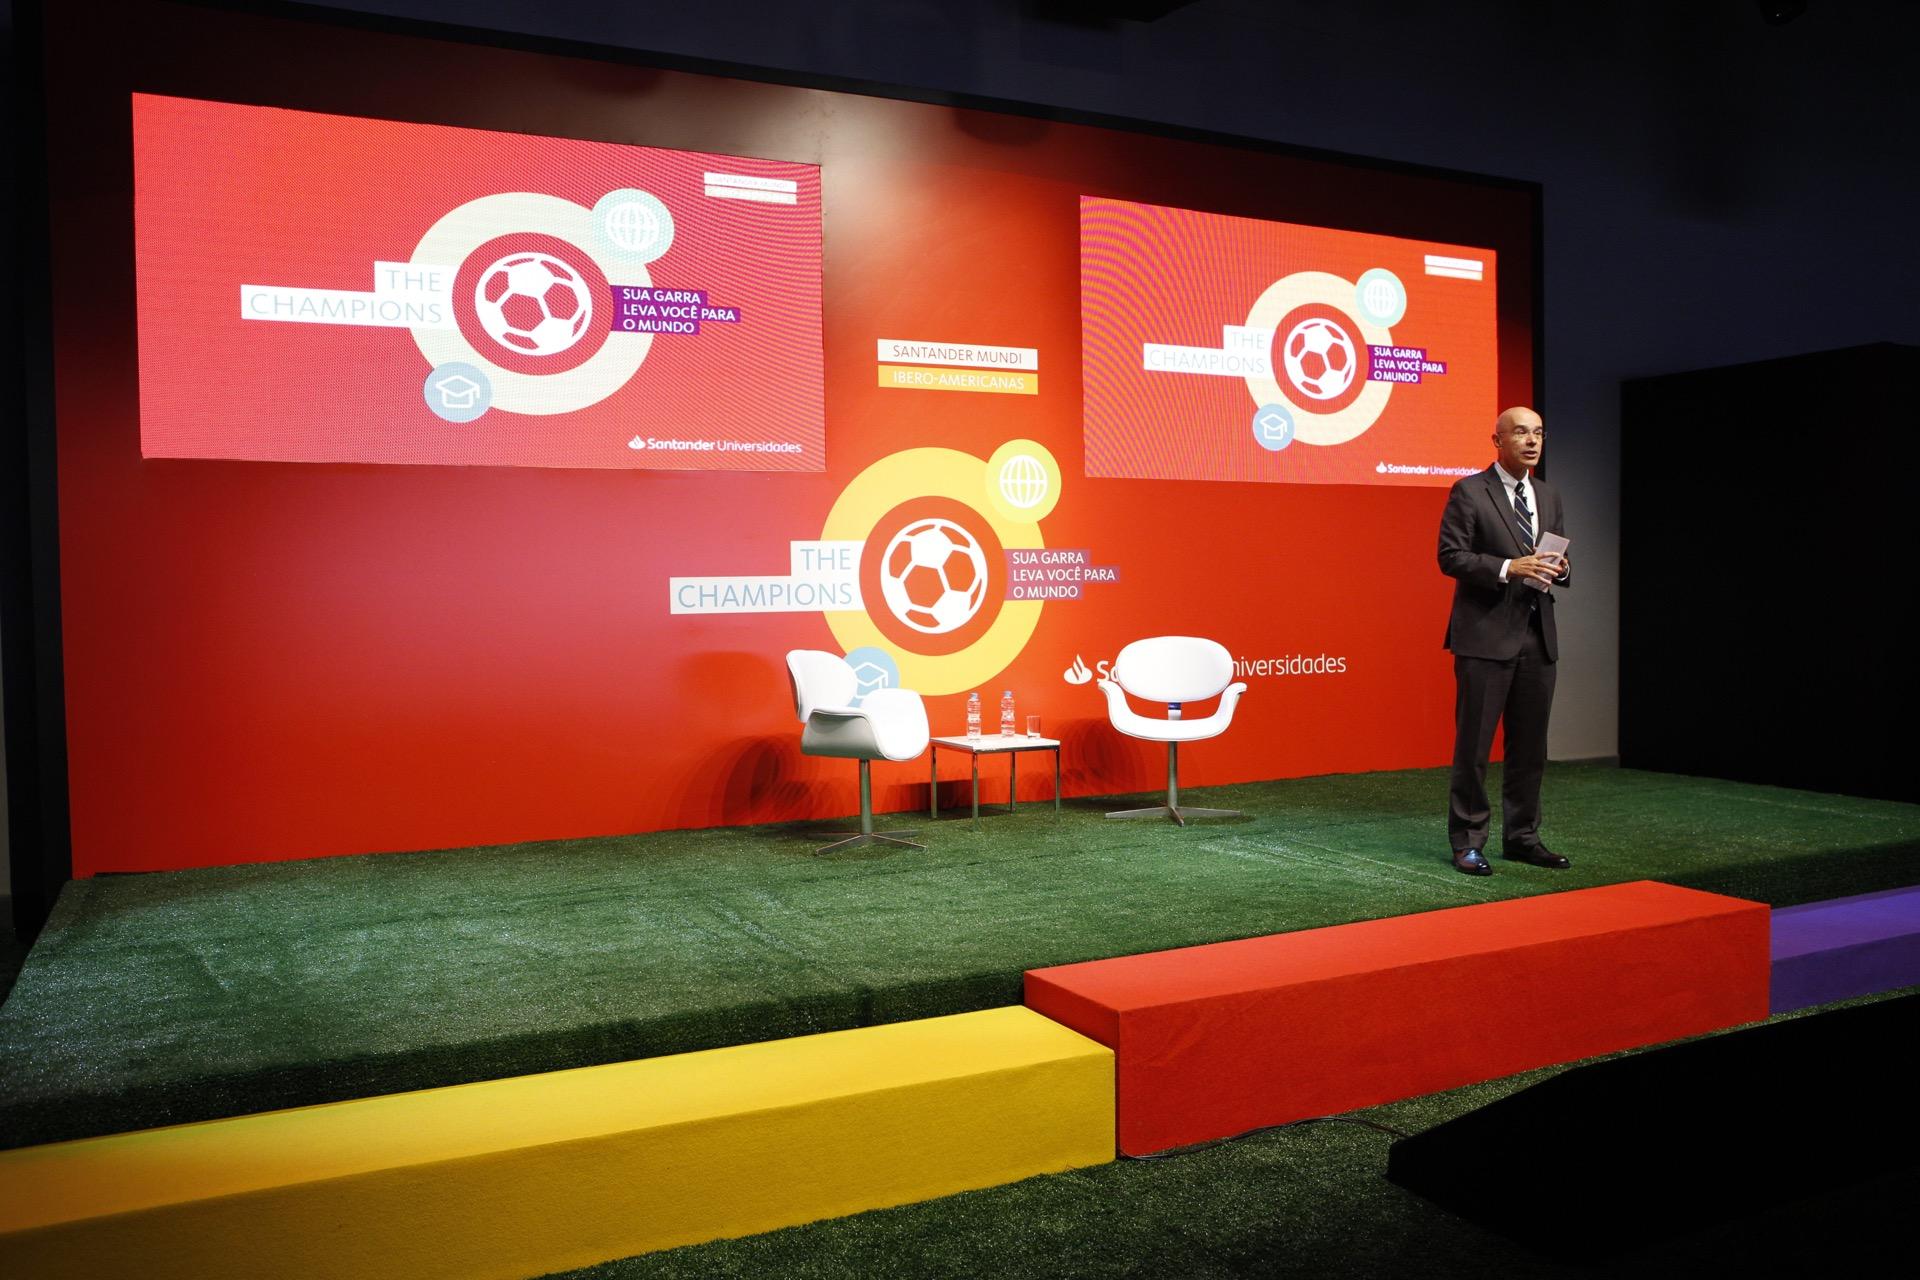 The Champions reúne contemplados dos programas de bolsas internacionais do Santander Universidades